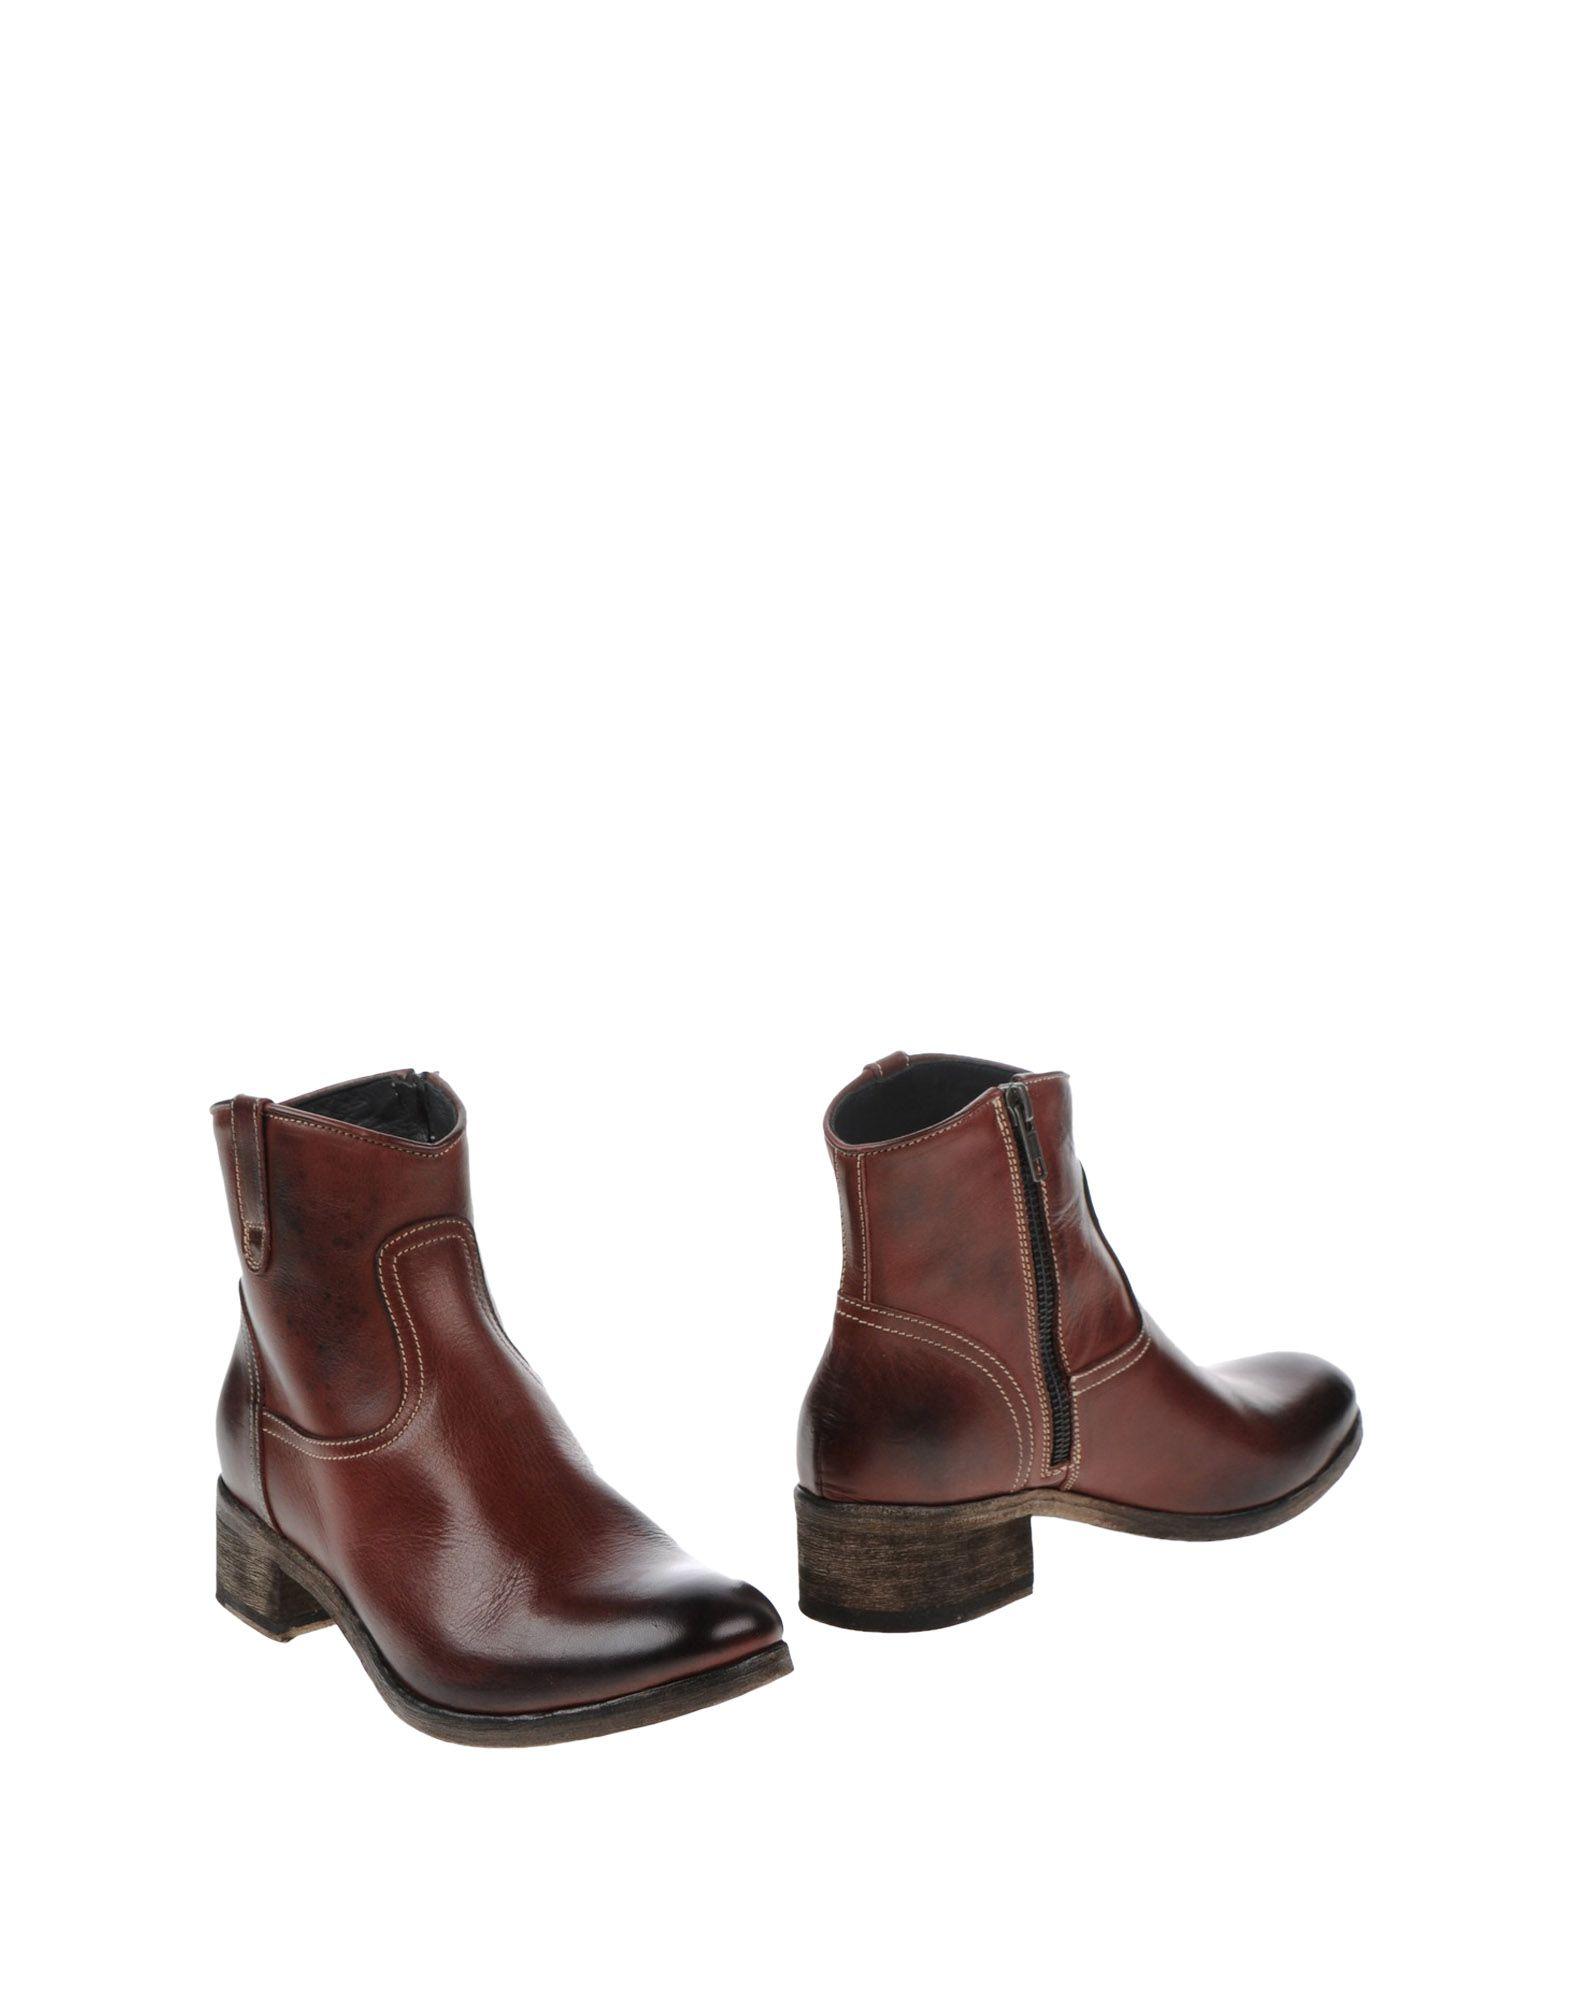 GIOVANNI CIARPELLA Полусапоги и высокие ботинки цены онлайн